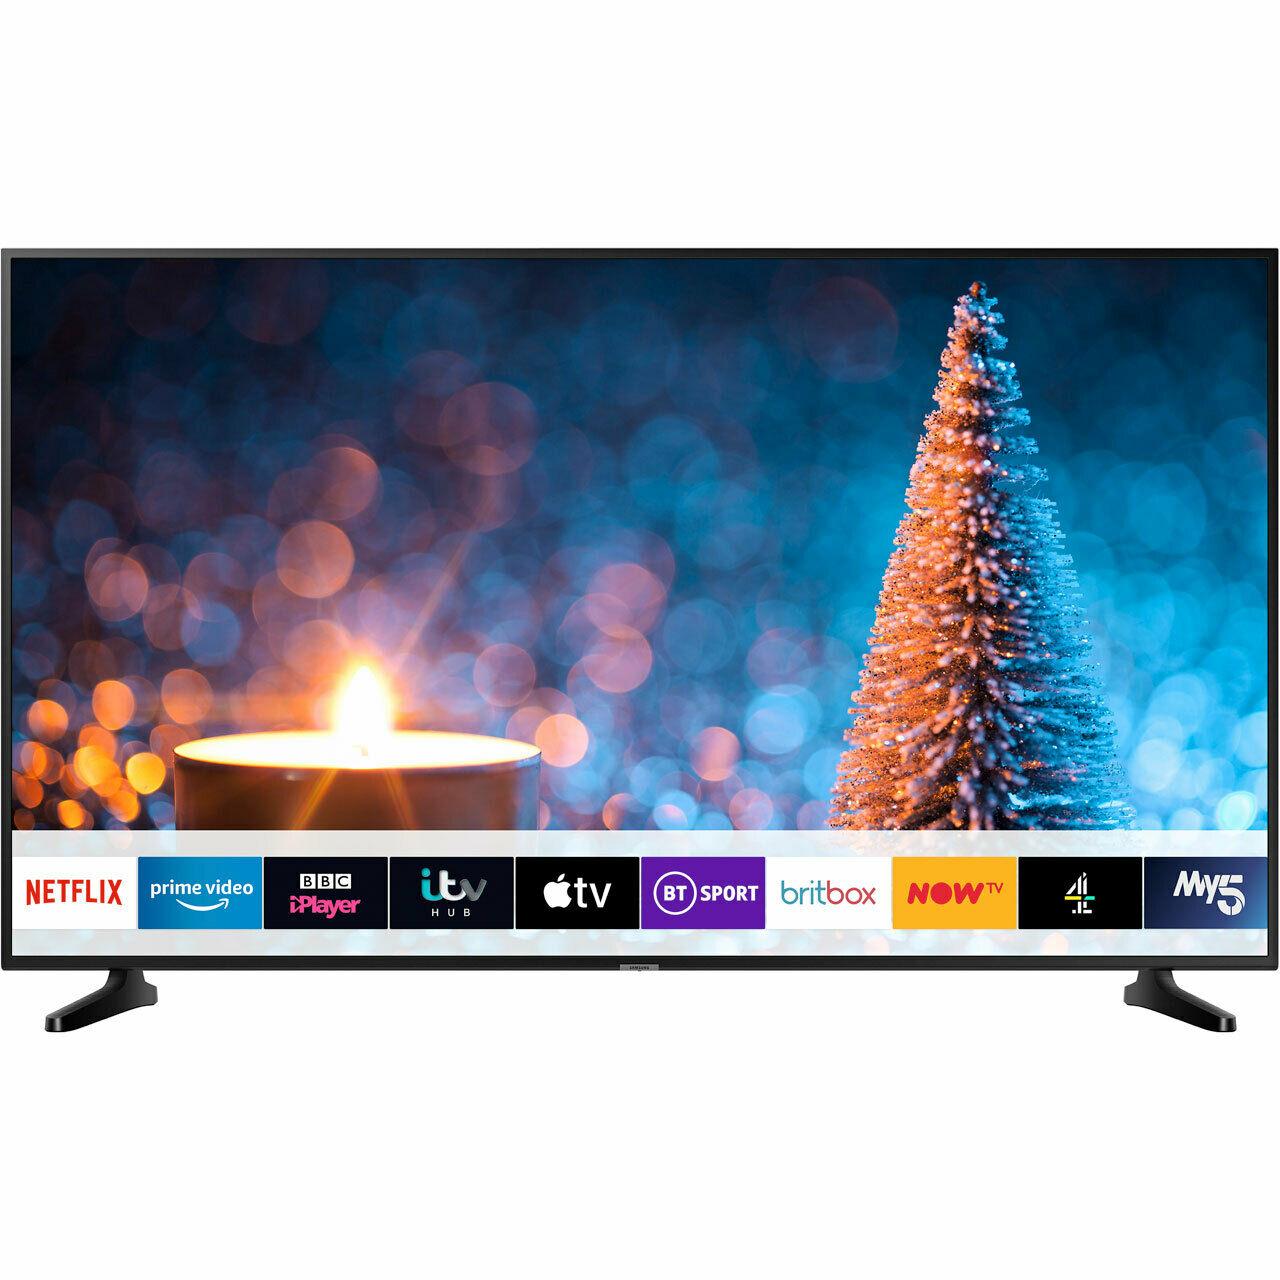 Samsung UE50RU7020 50 Inch TV Smart 4K Ultra HD LED Freeview HD 3 HDMI - £379 @ AO / eBay + possible 10% Quidco cashback